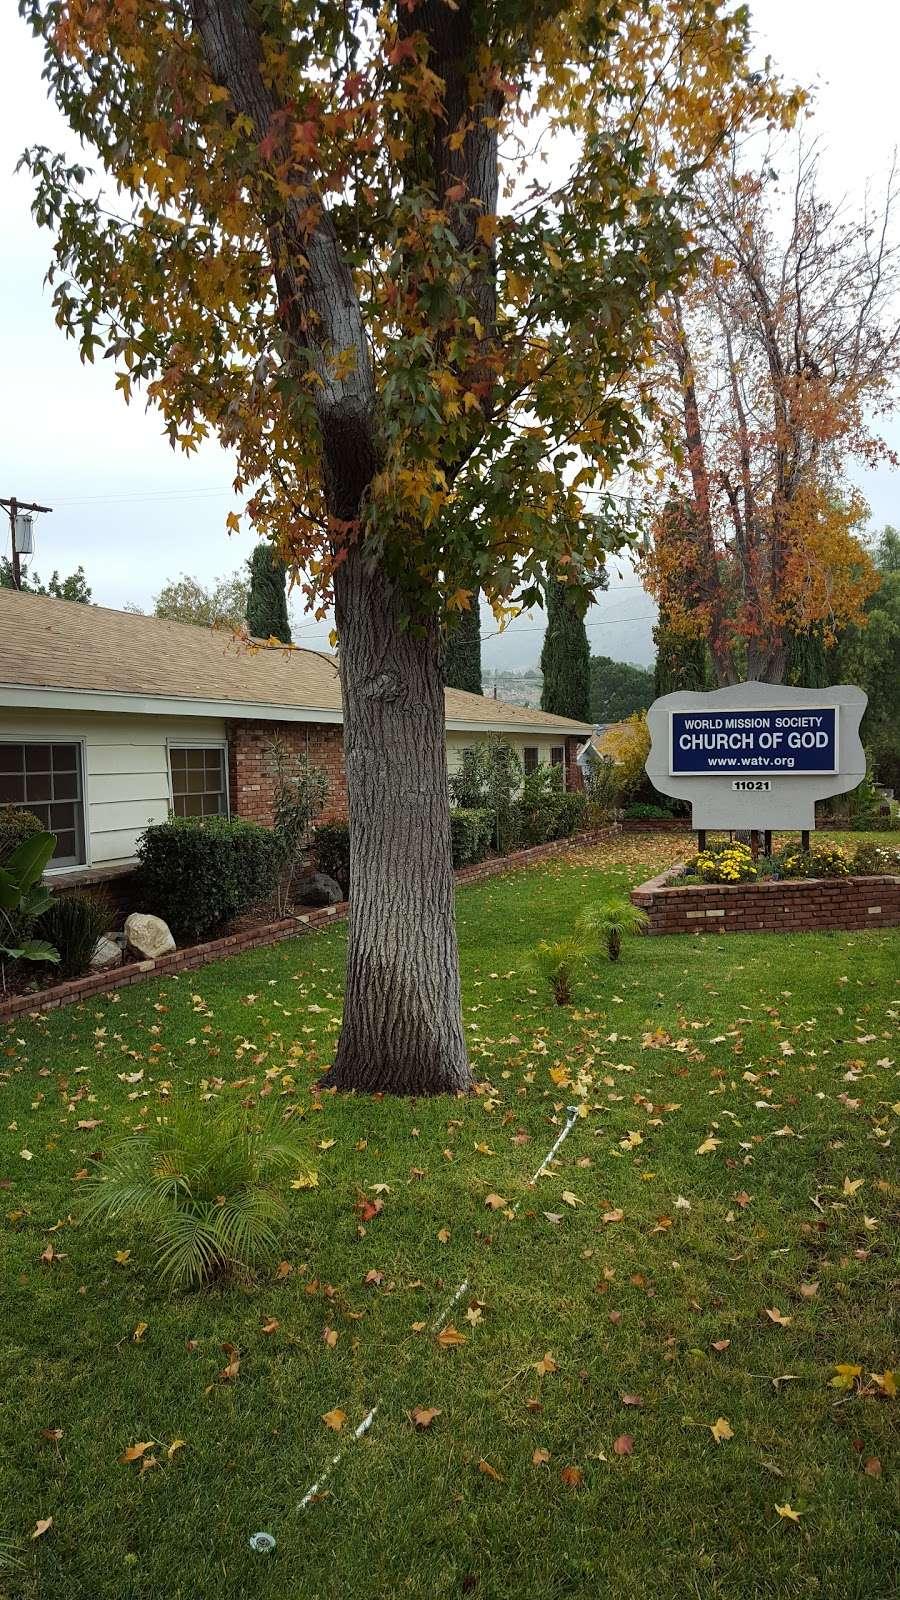 World Mission Society Church Of God - church  | Photo 8 of 10 | Address: 11021 Odell Ave, Sunland-Tujunga, CA 91040, USA | Phone: (323) 573-3333